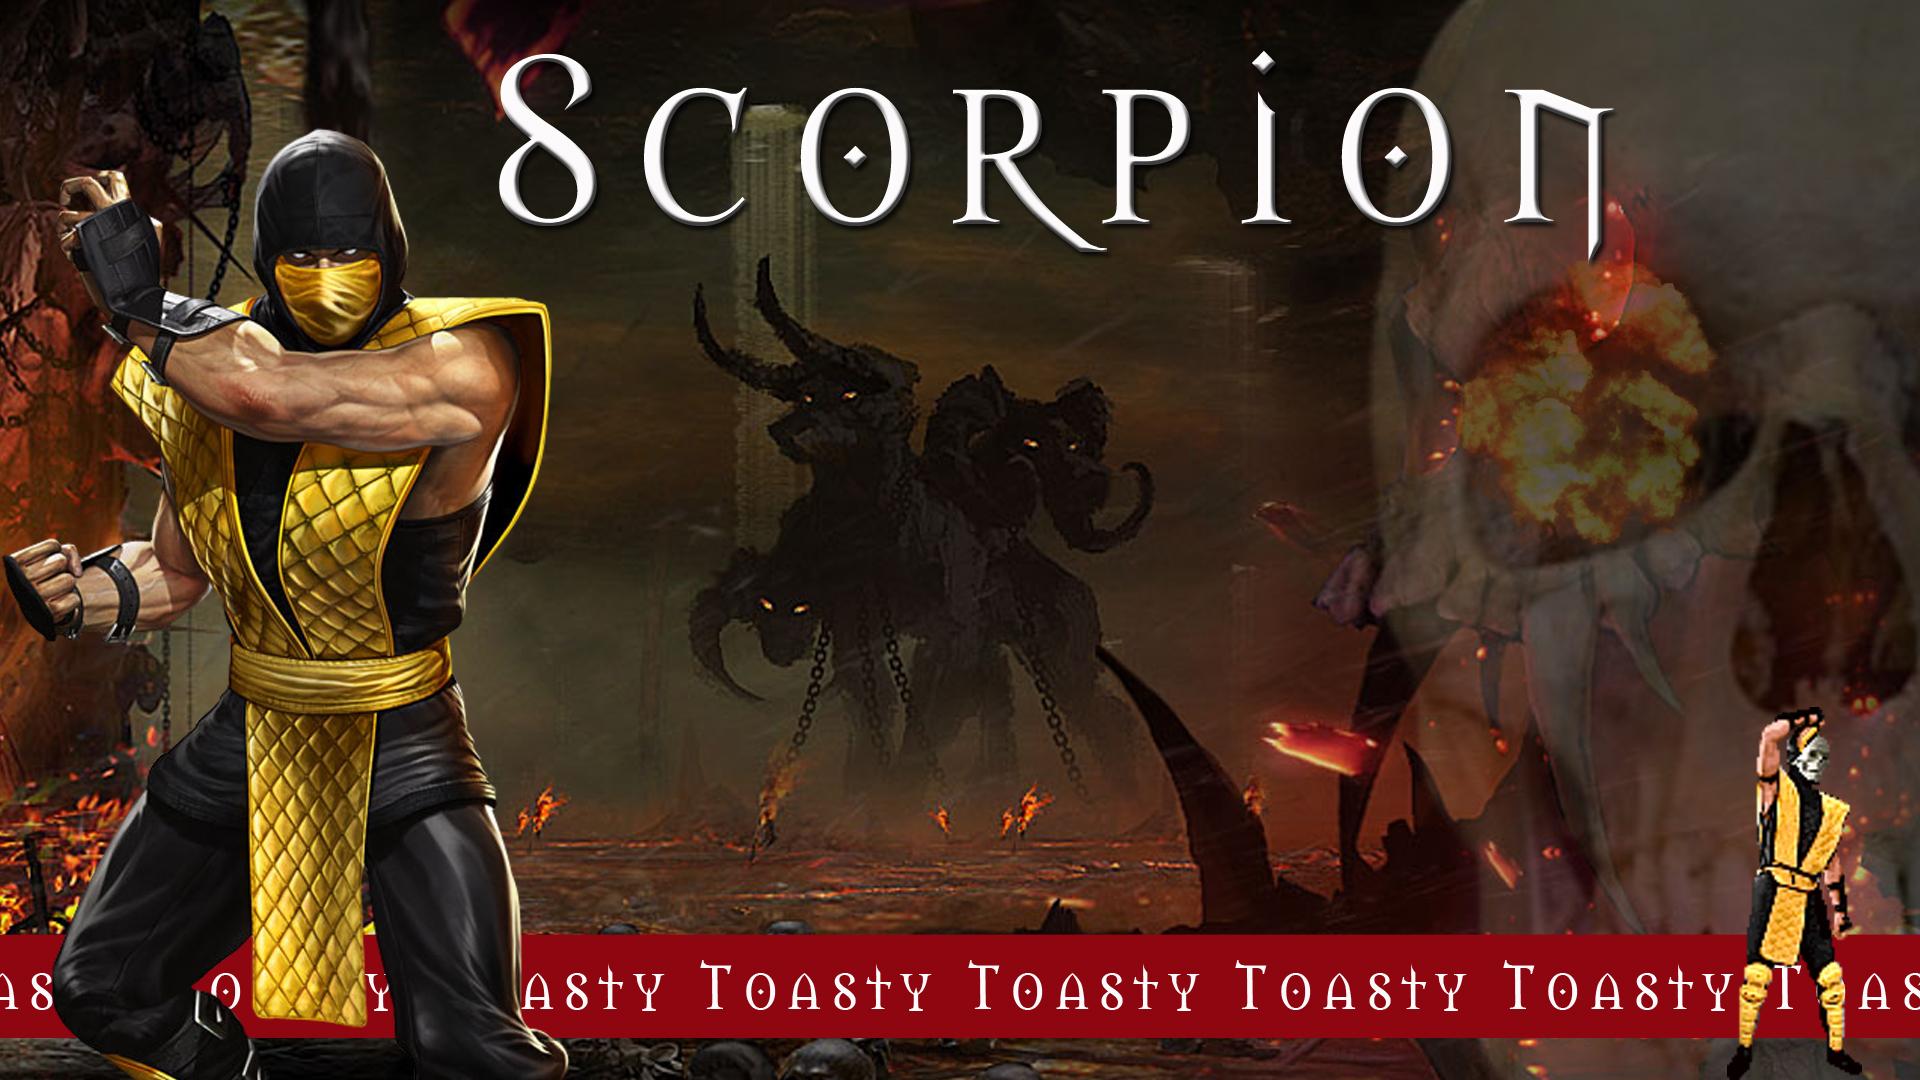 Klassic Scorpion Wallpaper By DarkGemineye